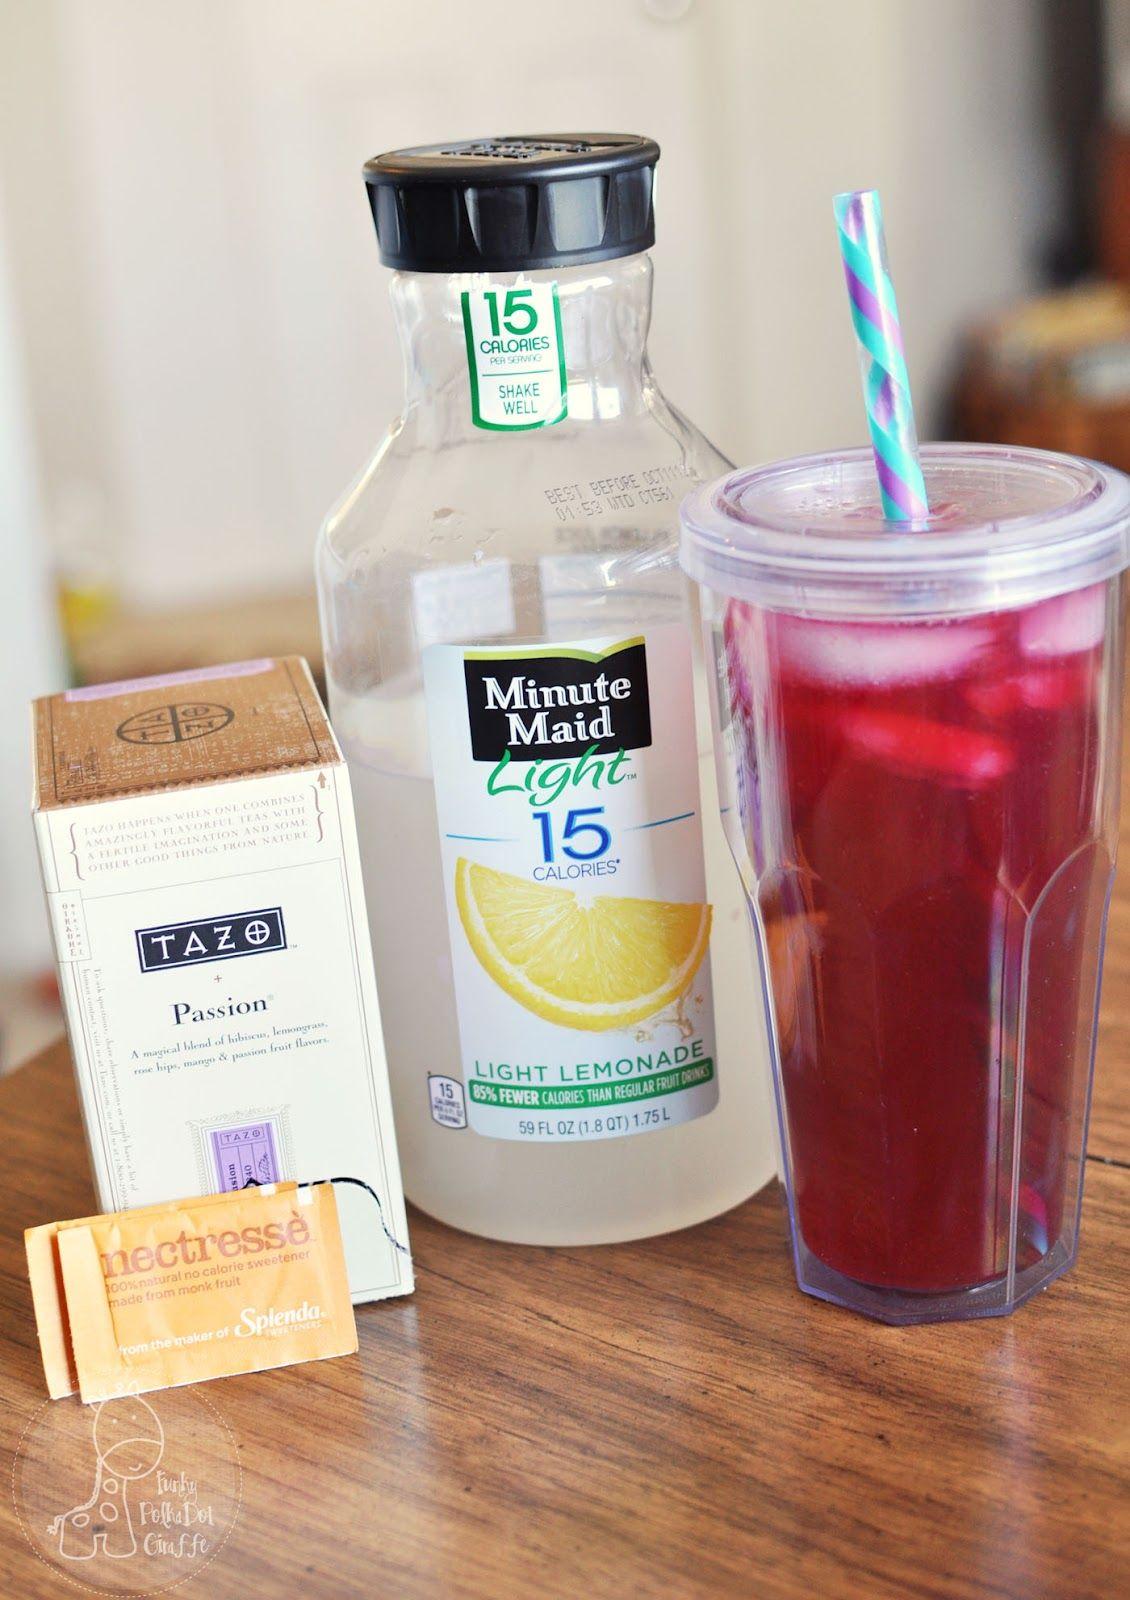 Copycat Recipe Of Starbucksu0027 Iced Passion Fruit Tea Lemonade. Iced Passion  Tea Lemonade  Tazo Passion Tea Light Lemonade Nectresse (or Other Sweetener)